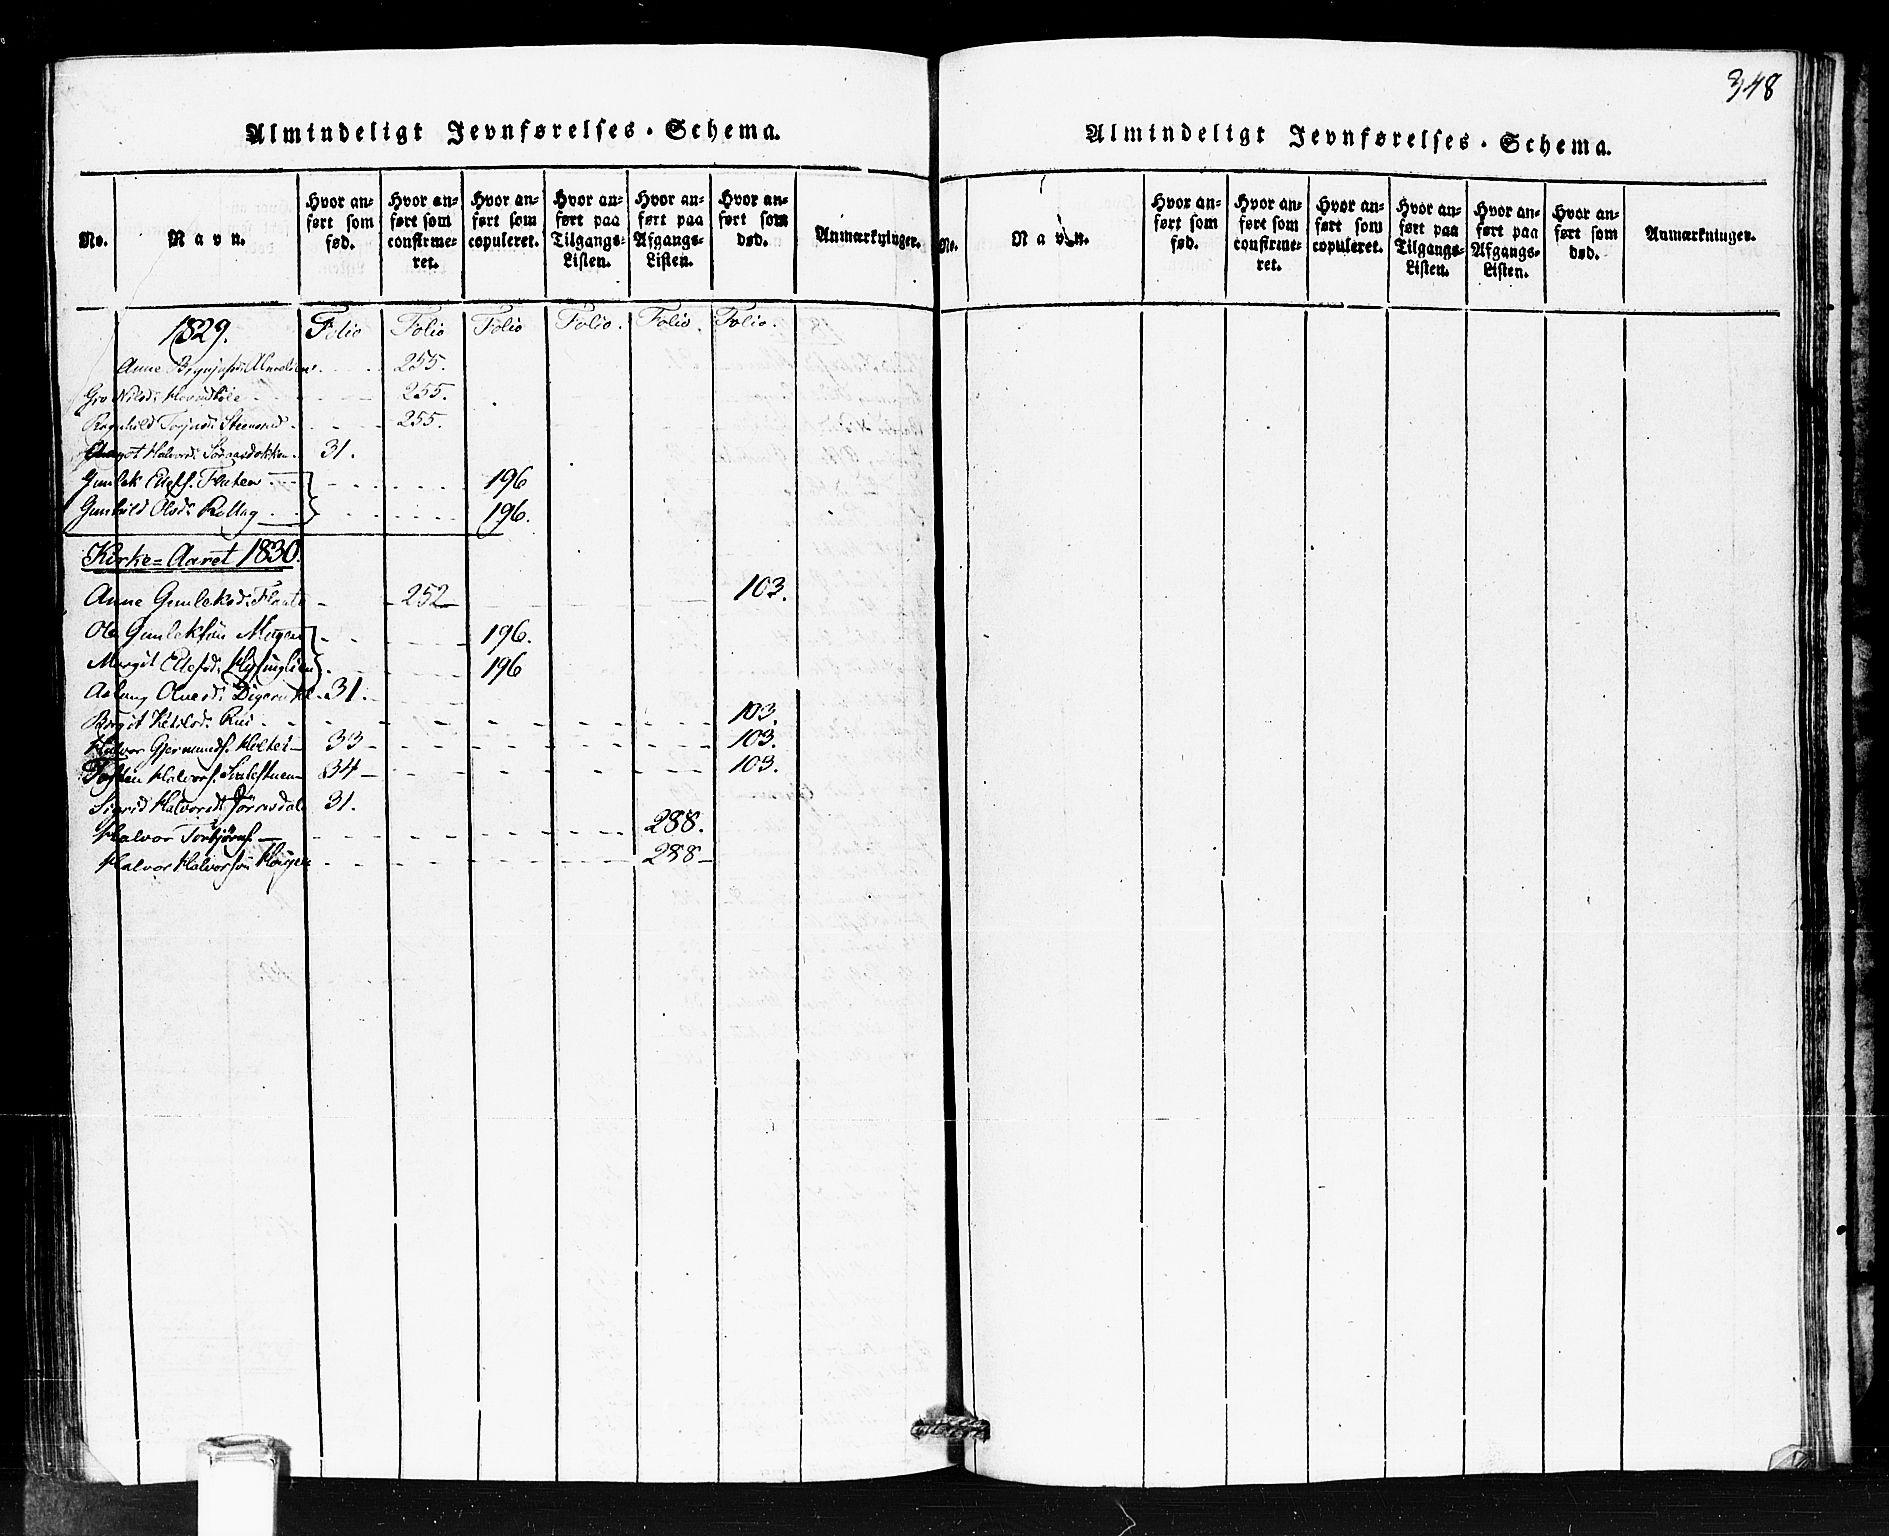 SAKO, Gransherad kirkebøker, F/Fb/L0002: Ministerialbok nr. II 2, 1815-1843, s. 348